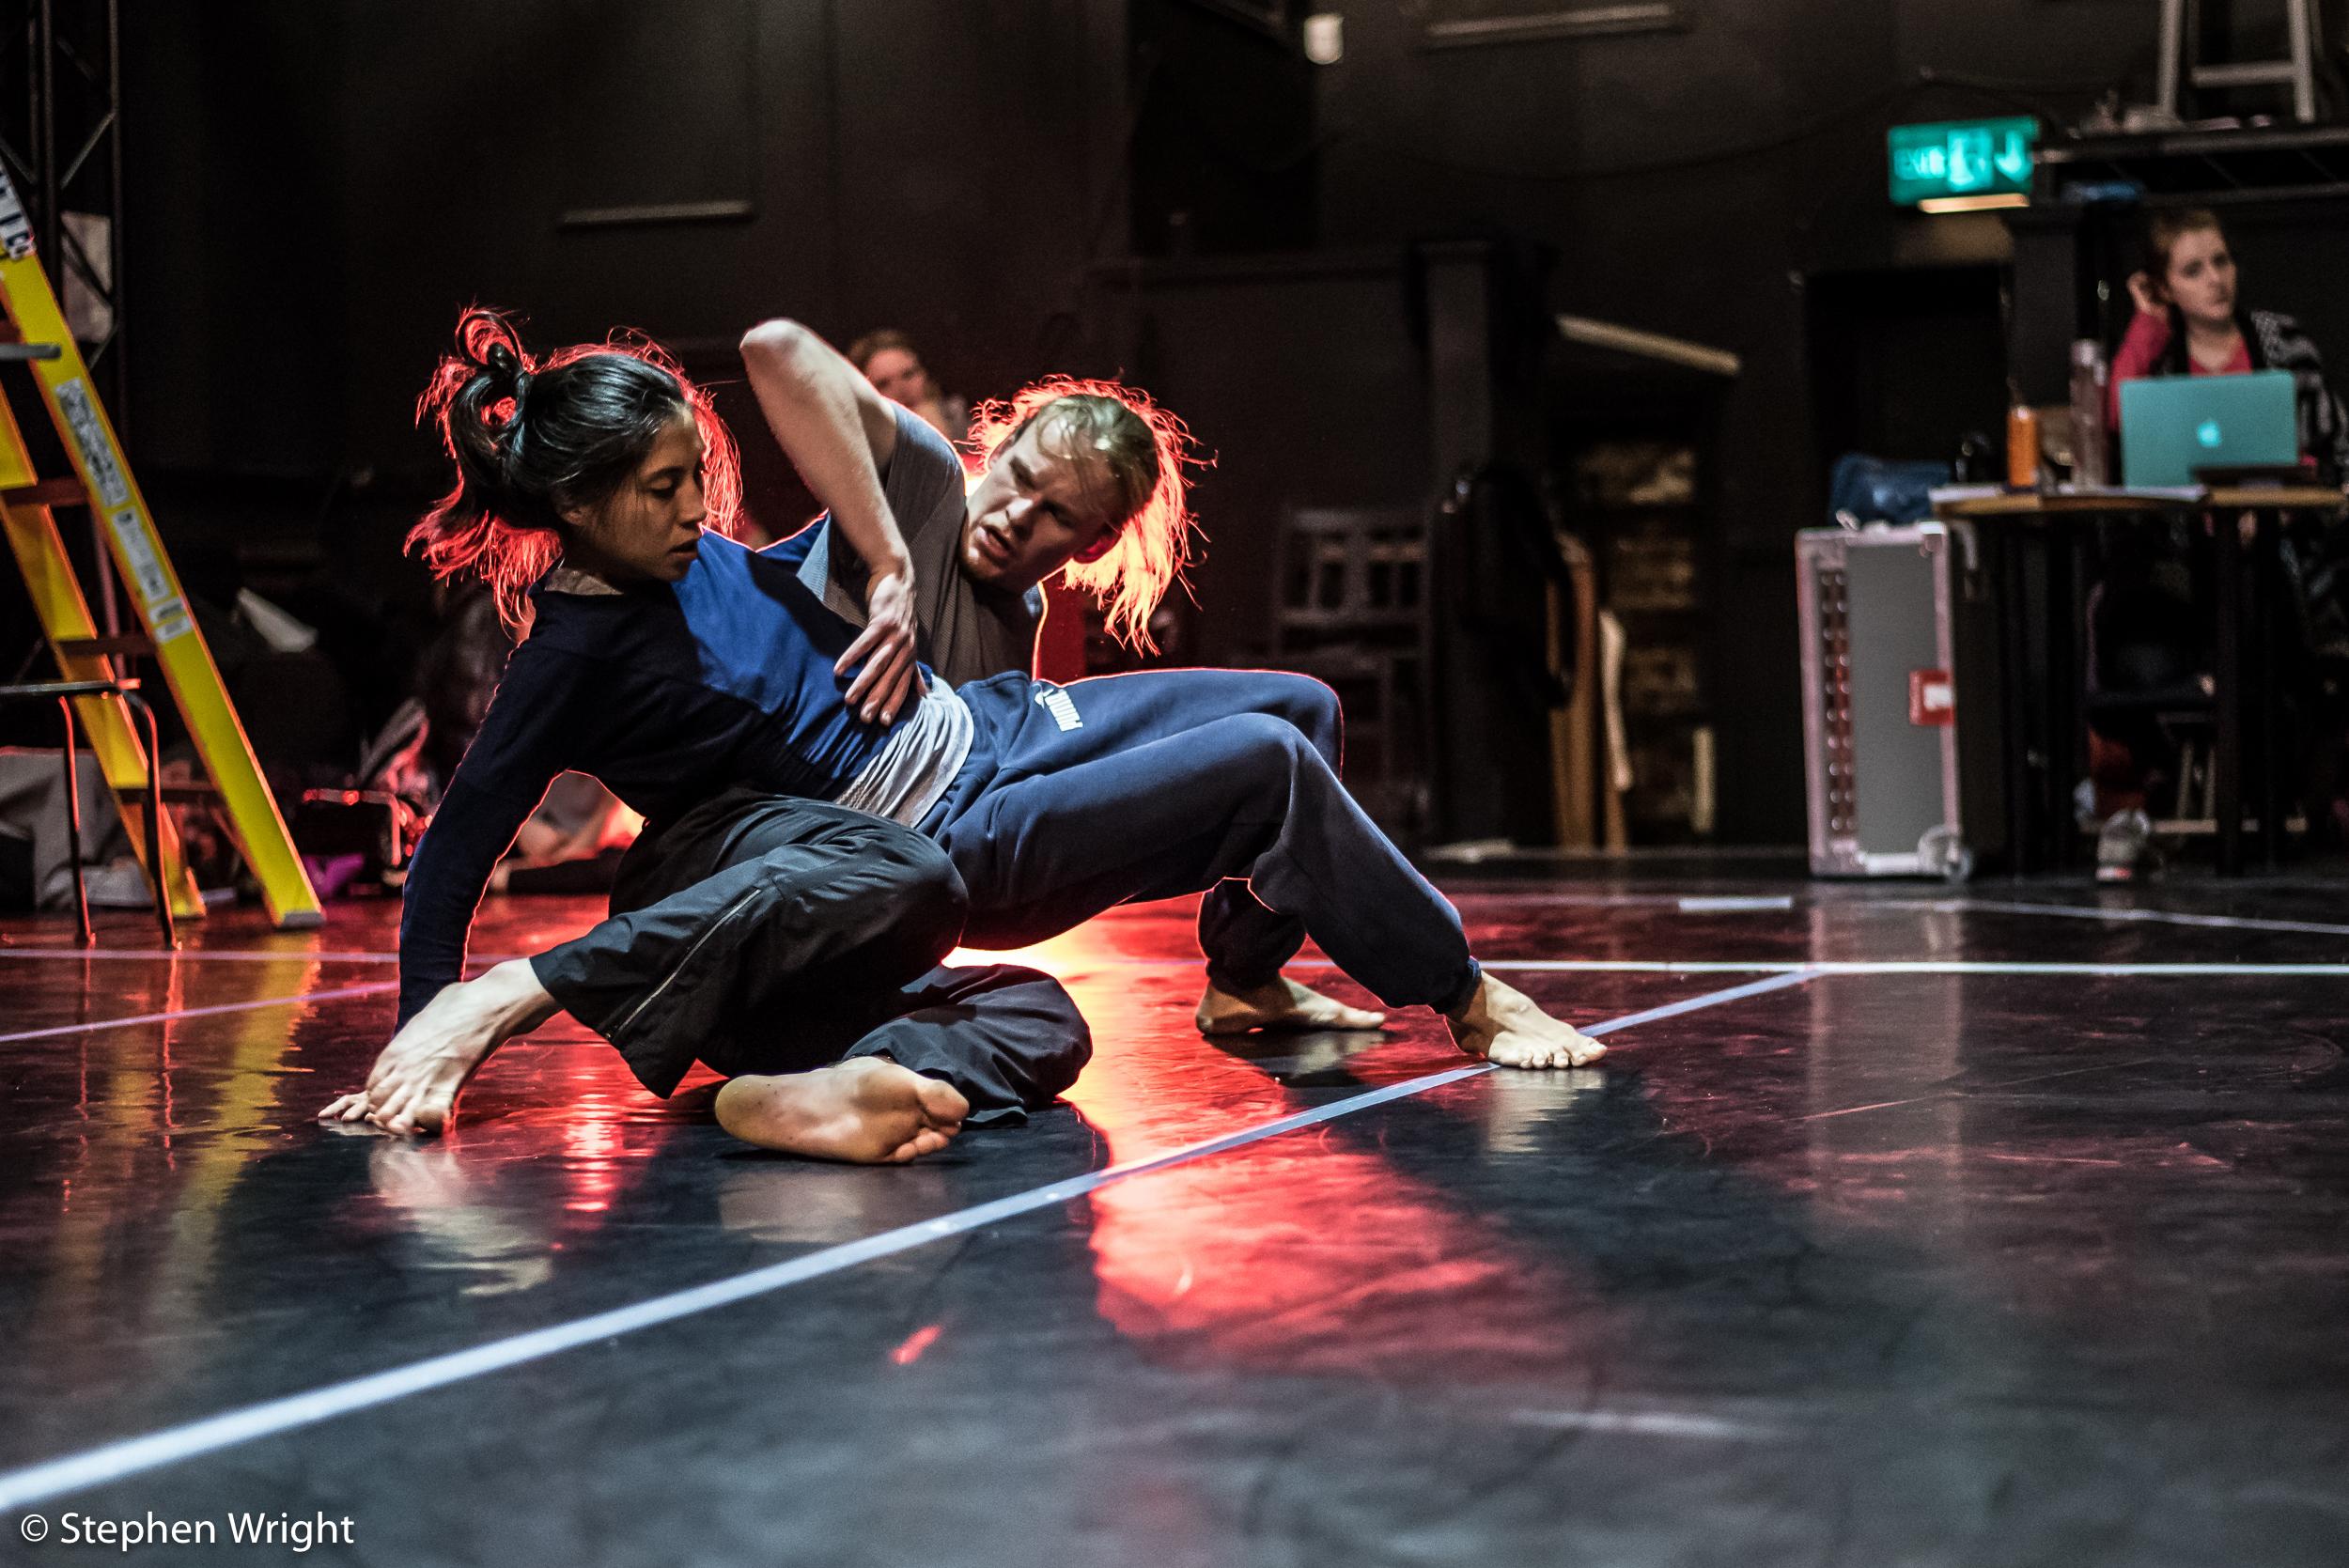 Estela Merlos  and  Rob Bridger  rehearsing   Terra  , choreographed by  Hubert Essakow  for  The Print Room .